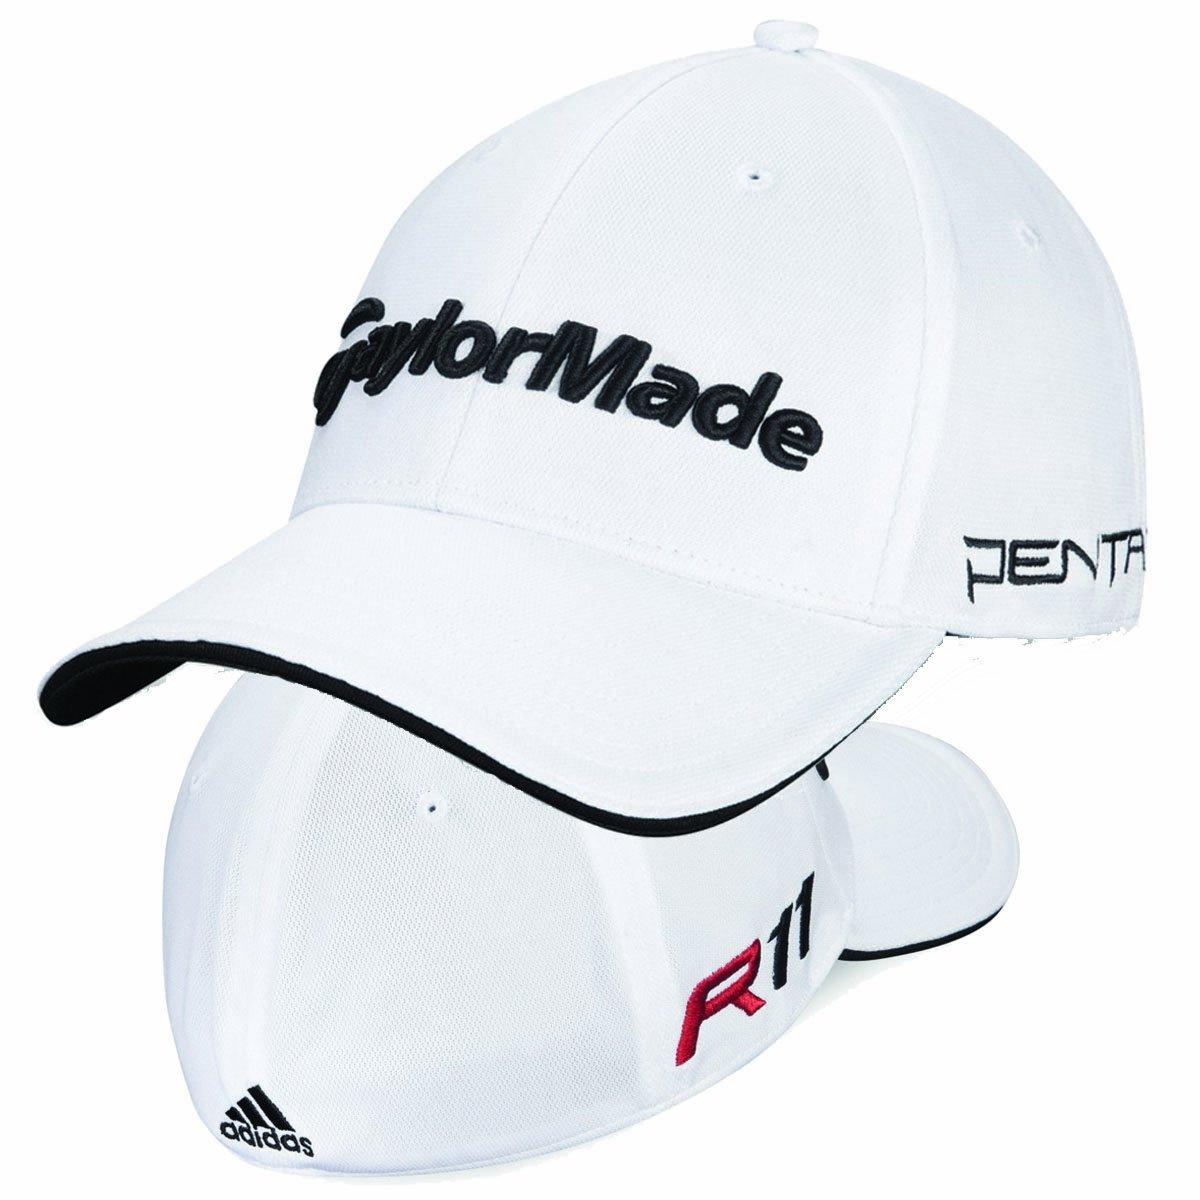 Adidas Taylormade Golf R11 Tour Penta Baseball Cap White  Amazon.co.uk   Clothing 64a1397b8fa